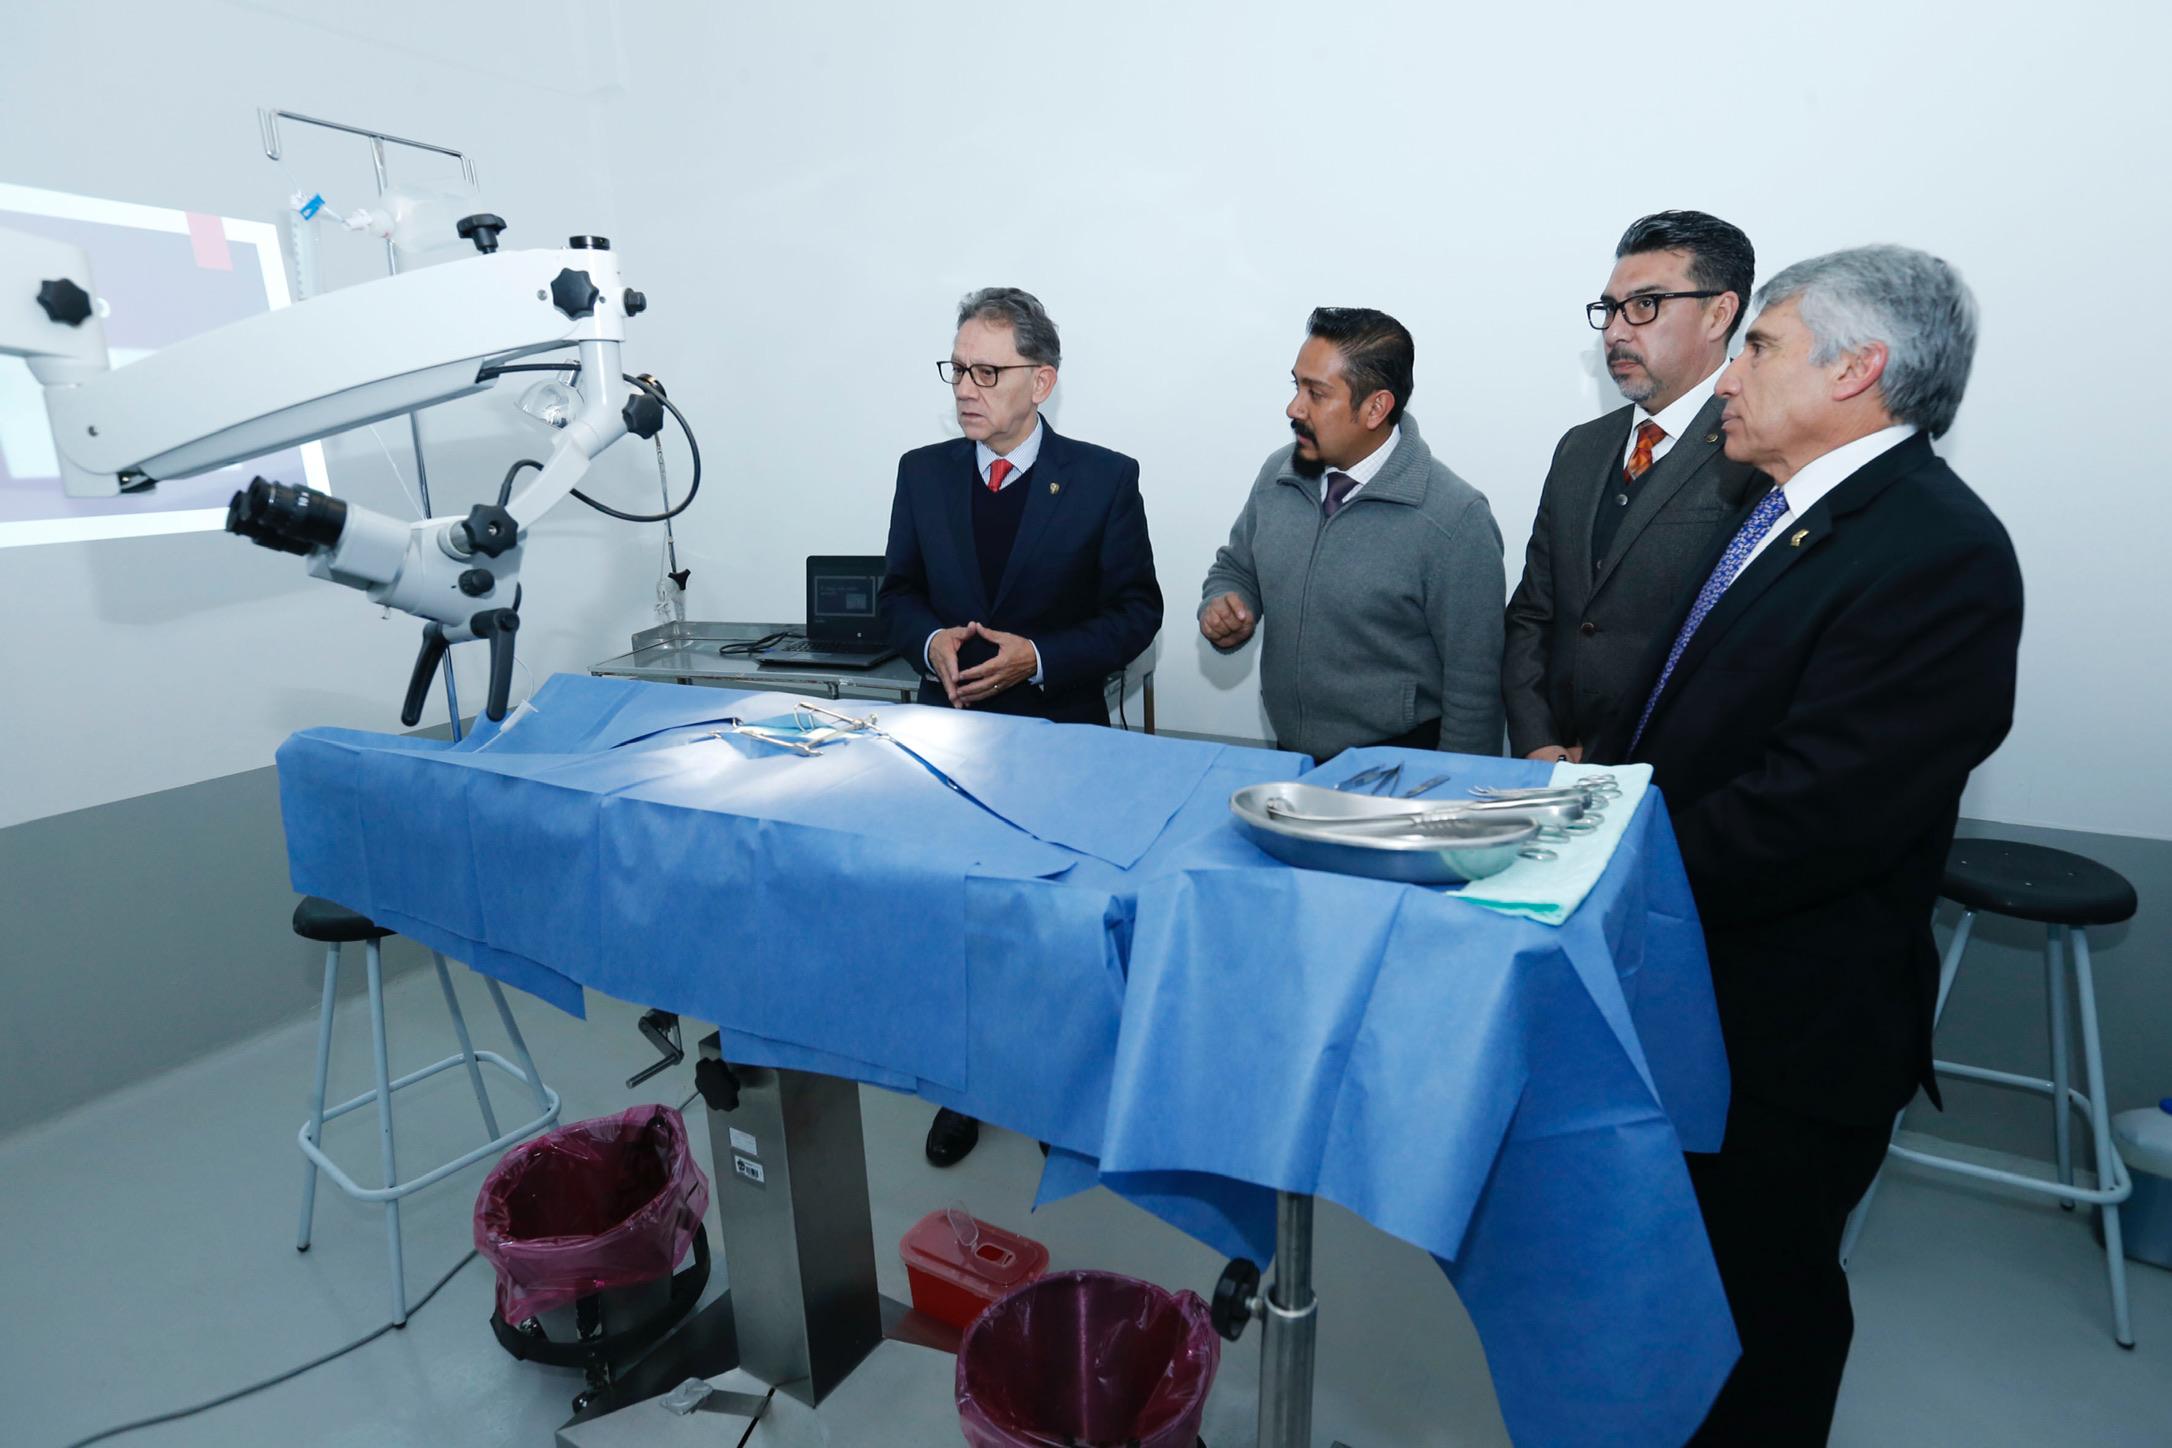 Rehabilitan instalaciones de medicina en UAEM